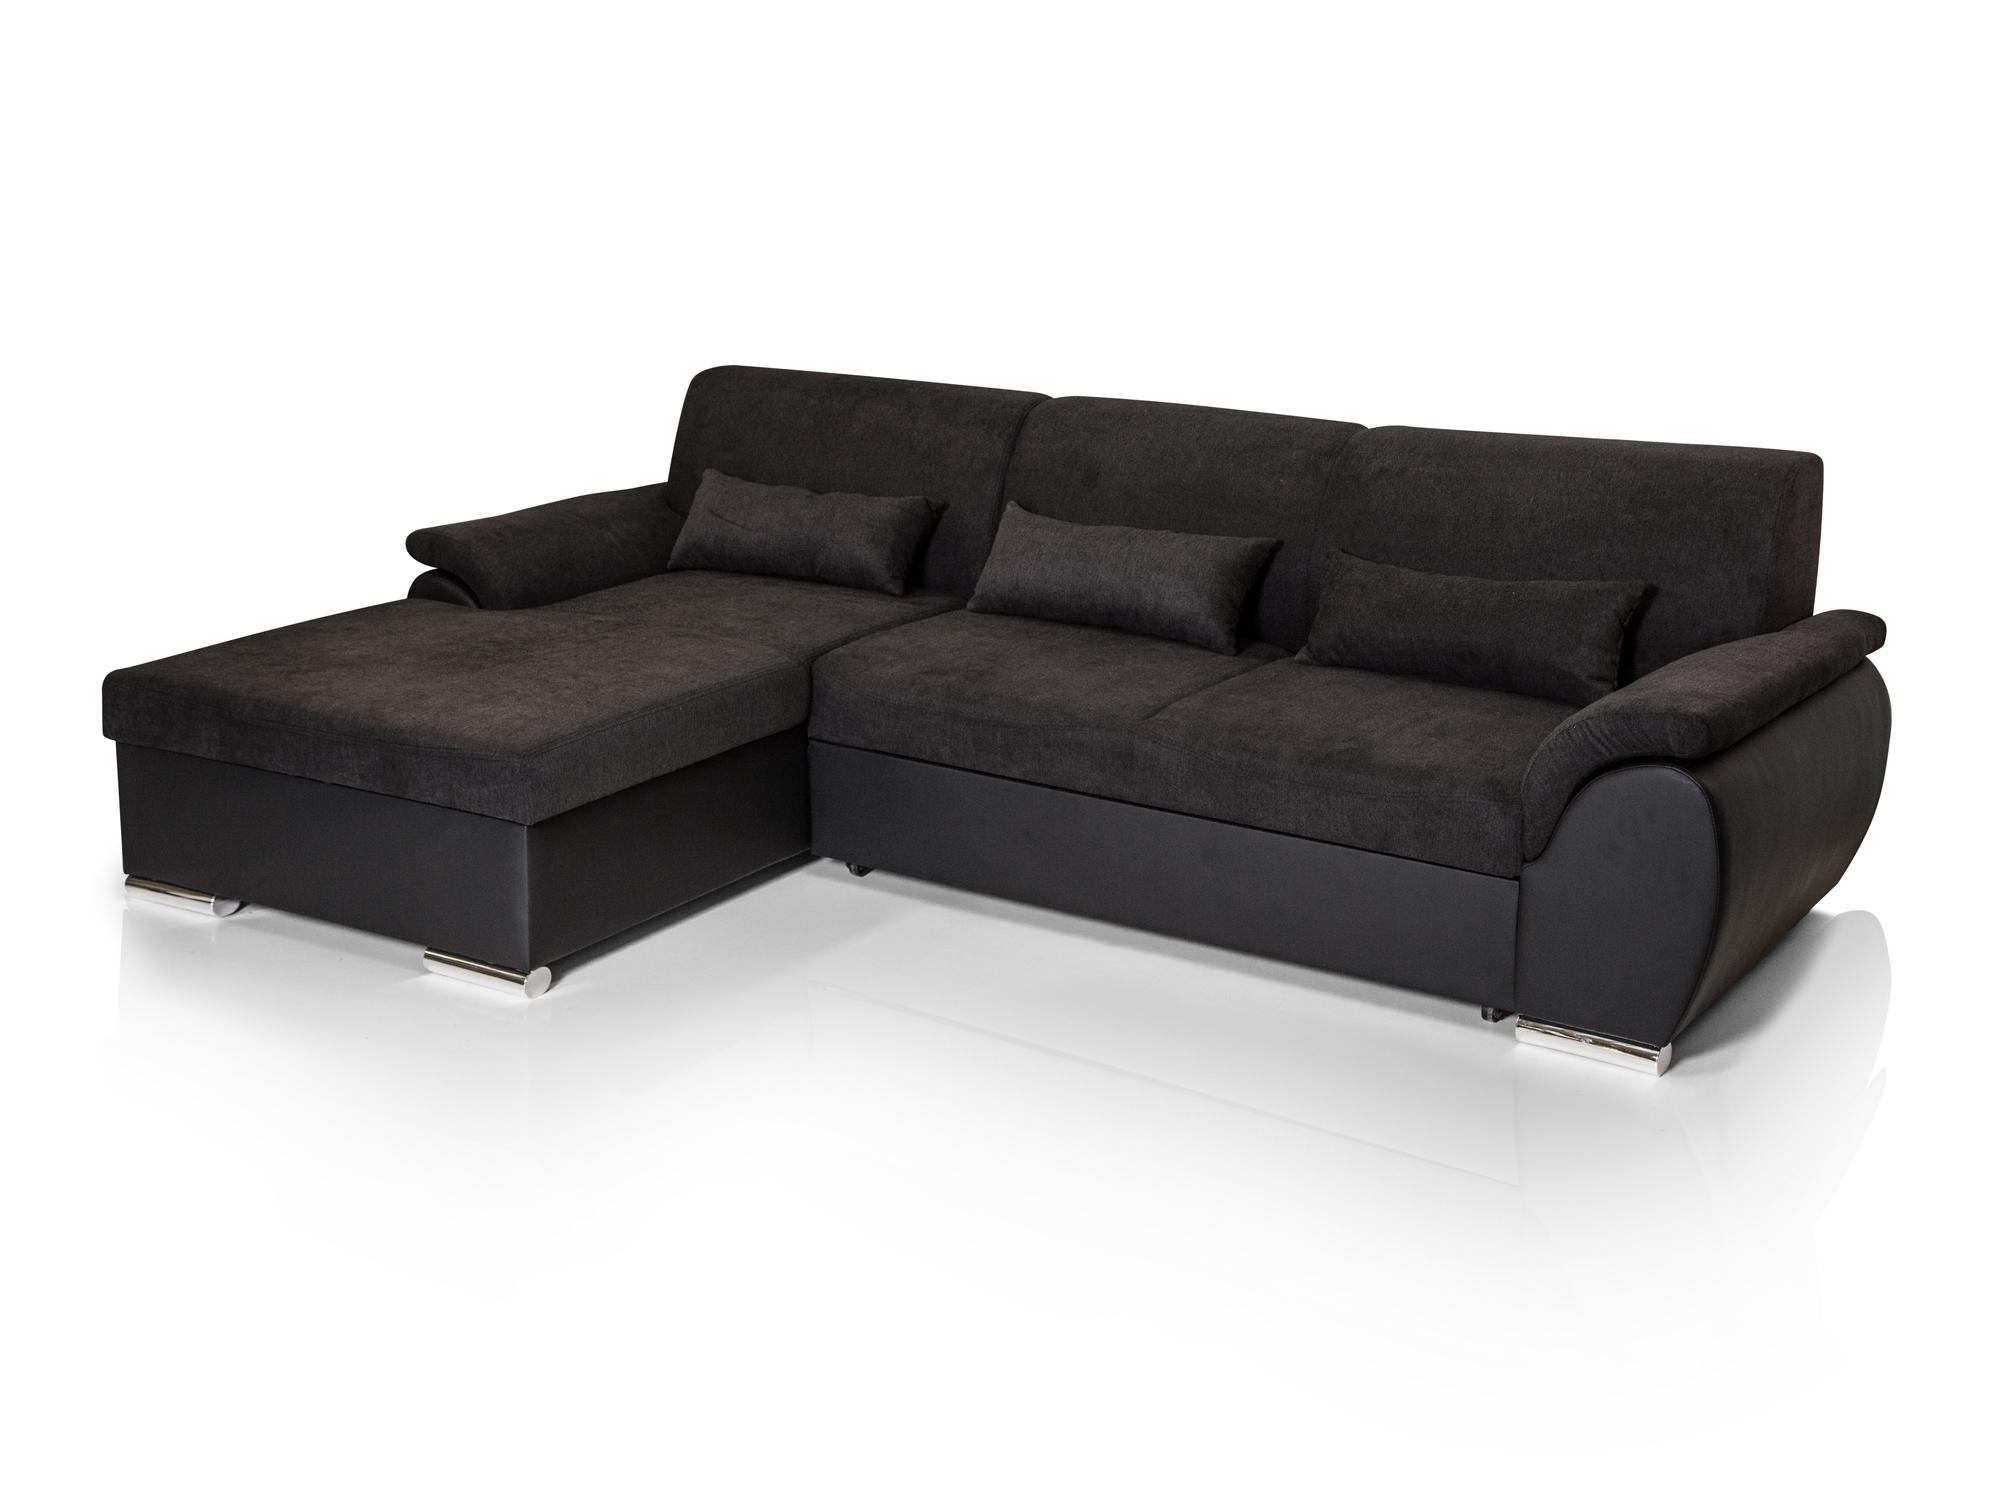 SALZBURG Ecksofa Eckcouch Couch Ottomane links + Bettfunktion ...